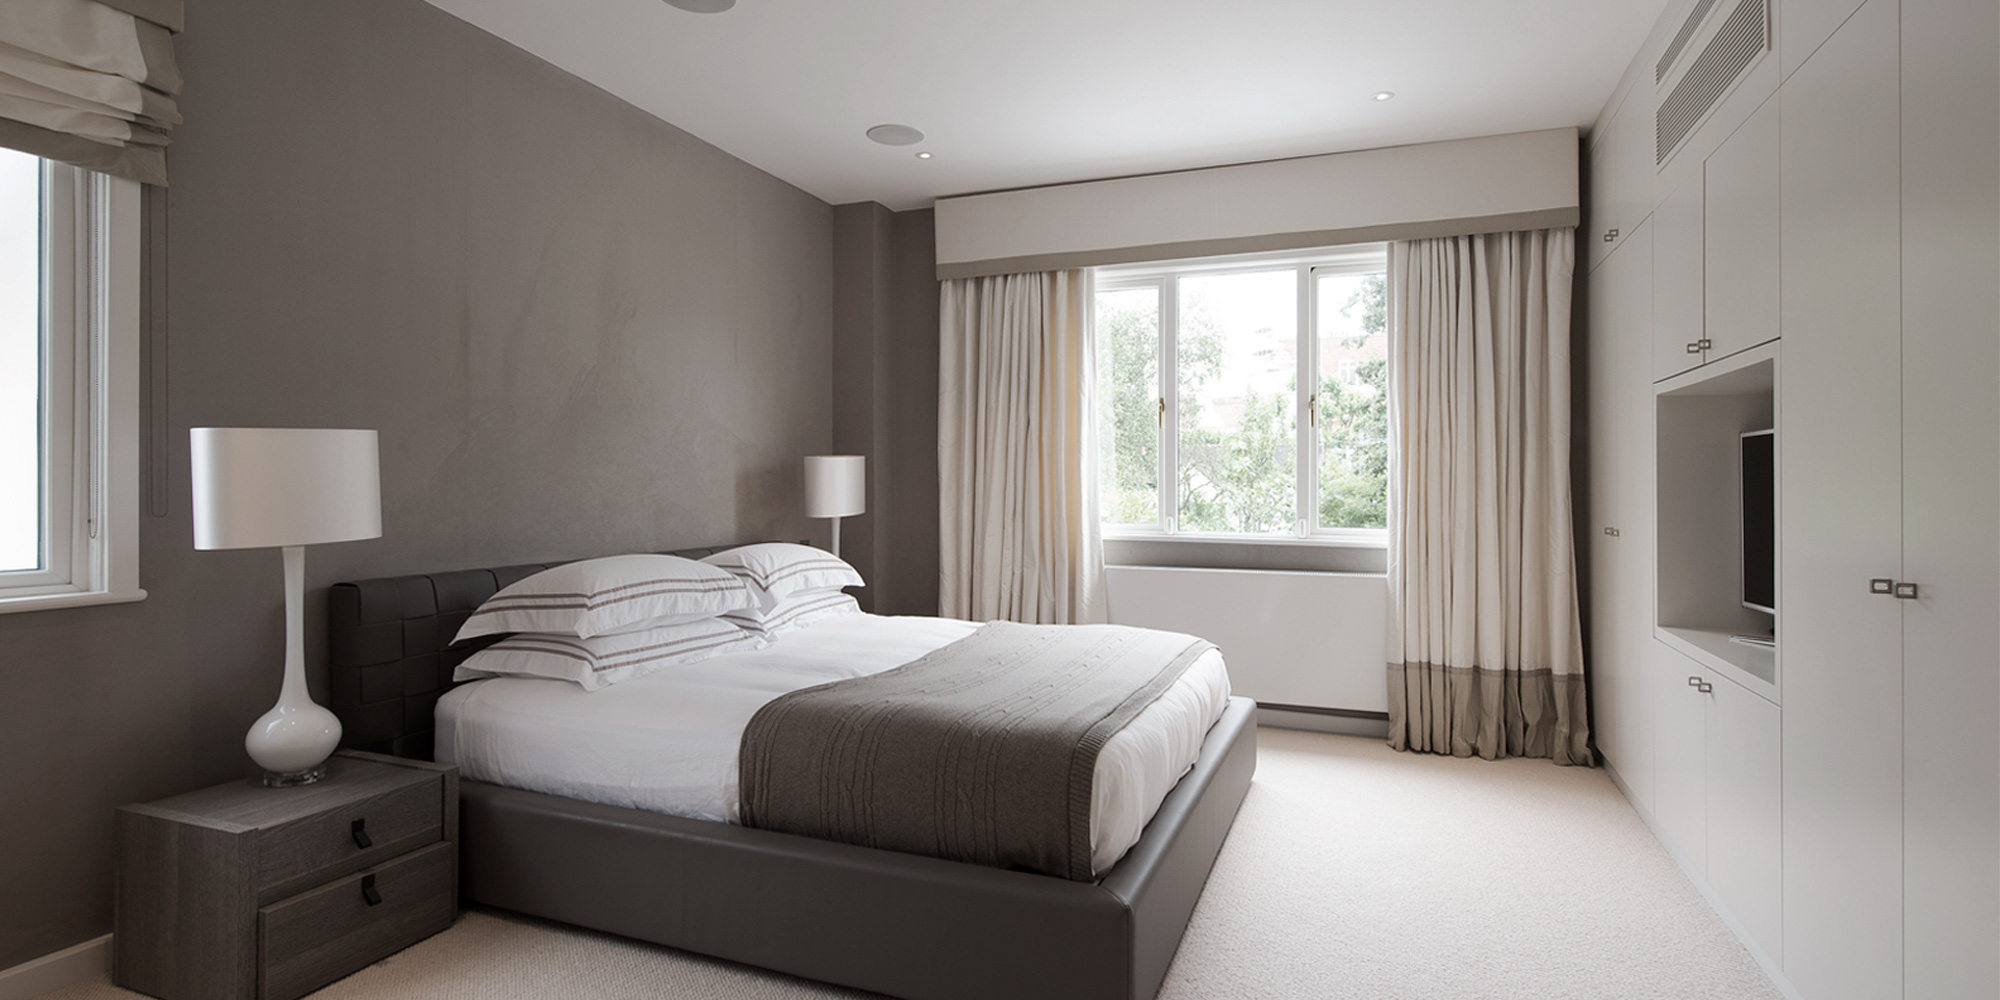 2-nikki-rees-luxury-bedroom-interior